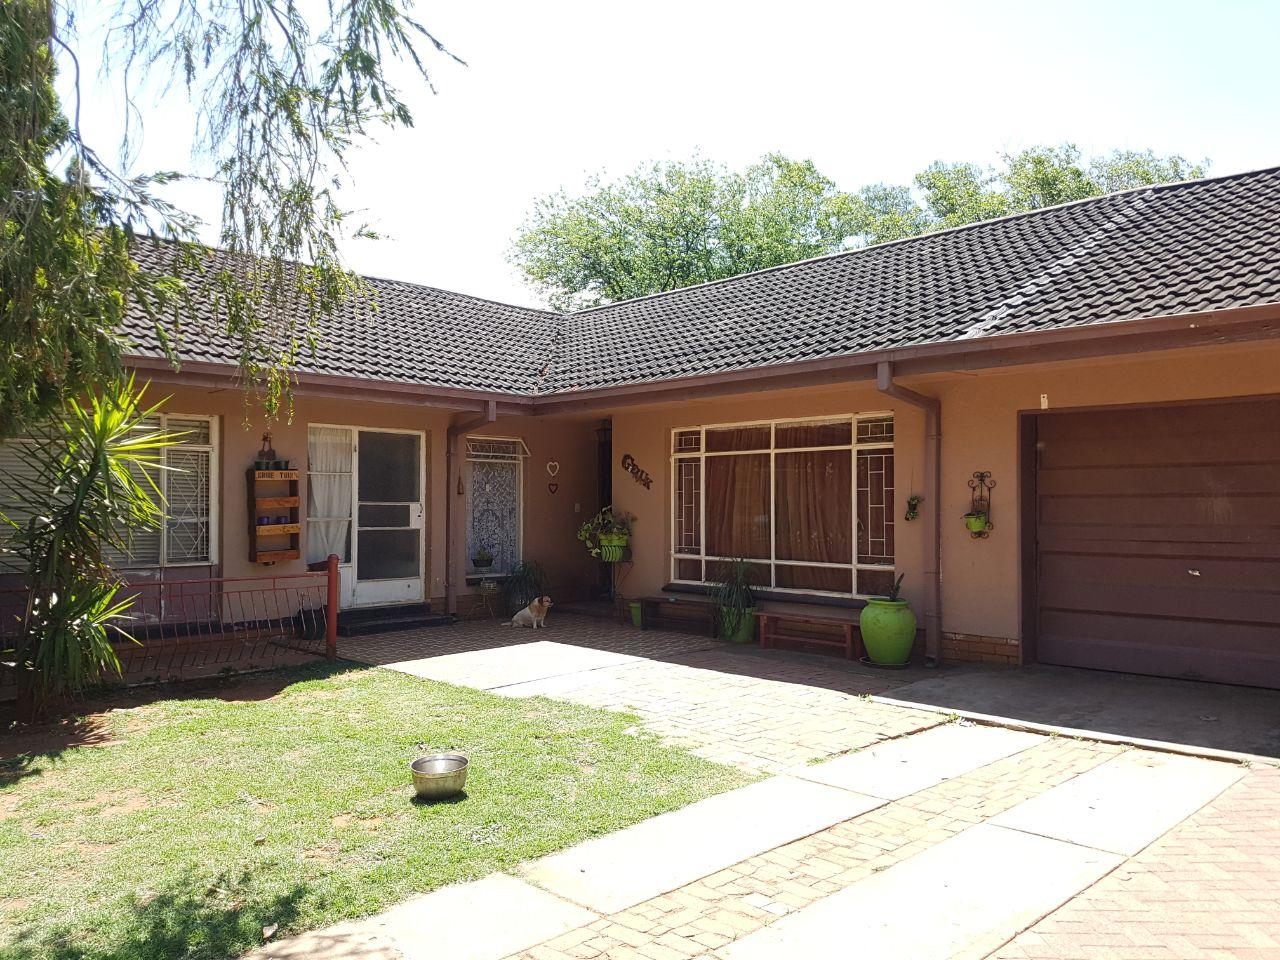 4 BedroomHouse For Sale In Stilfontein